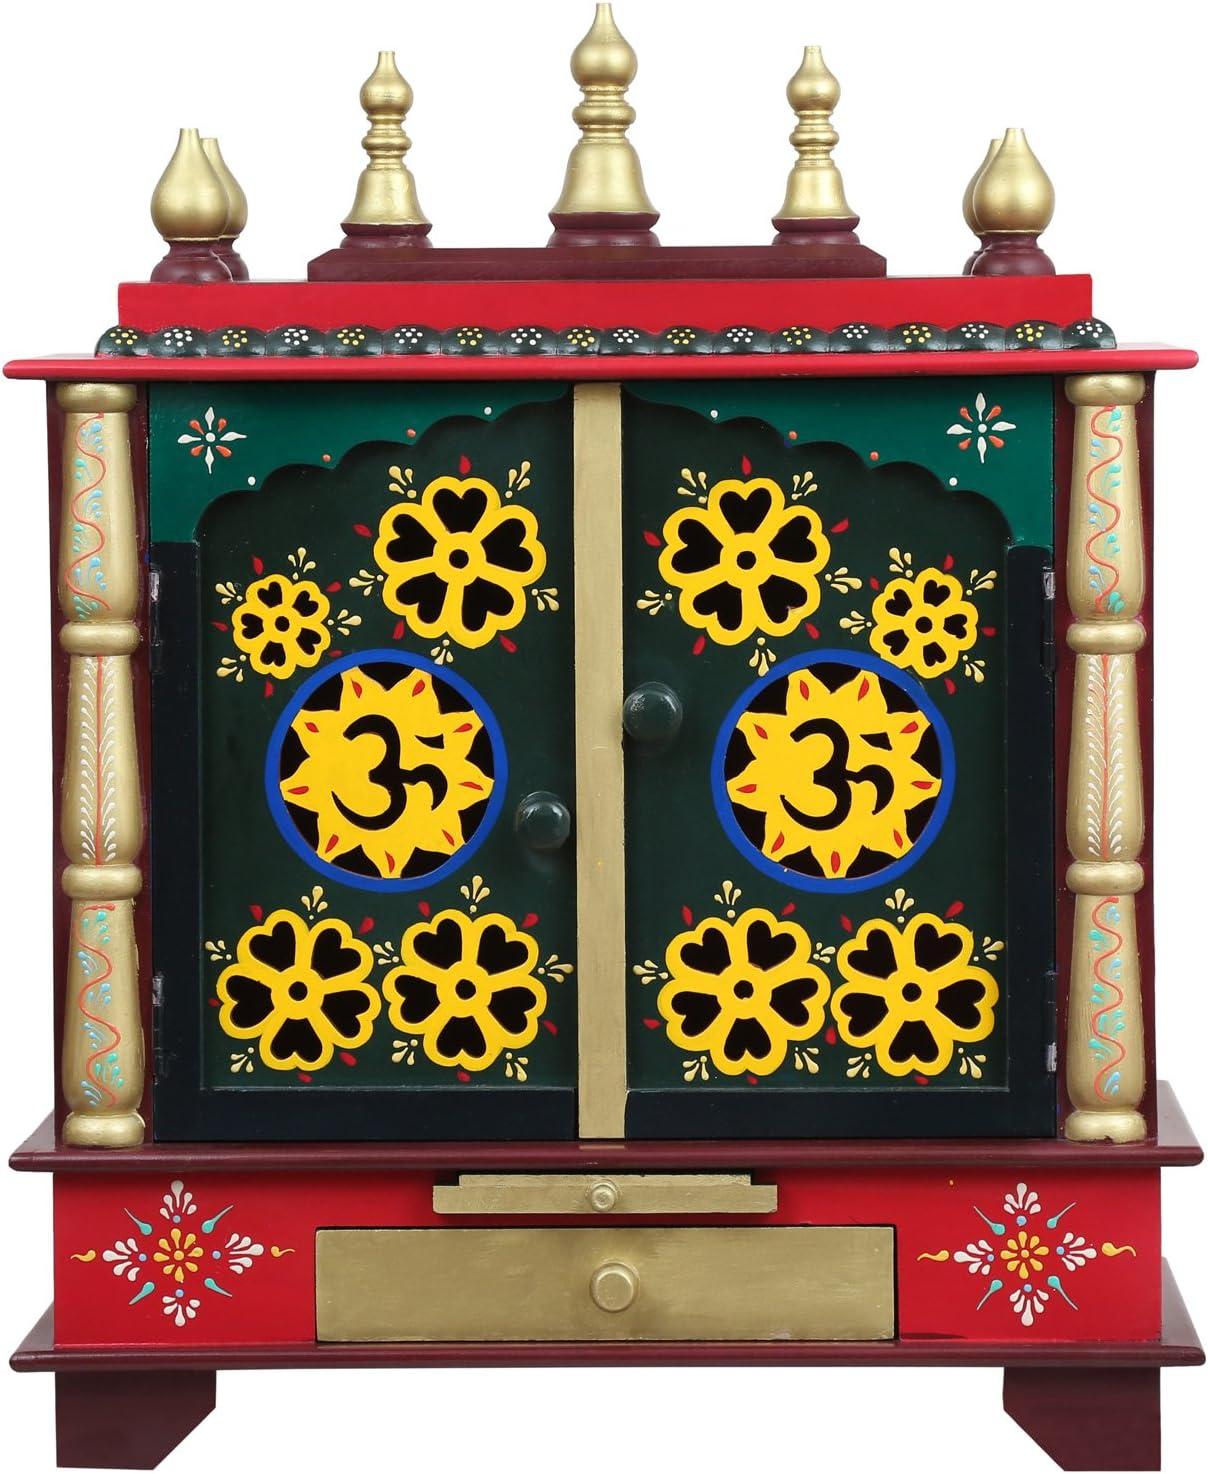 Homecrafts Wooden Temple, Pooja Mandir for Home, 24 X 12 X 30-inch (Green)